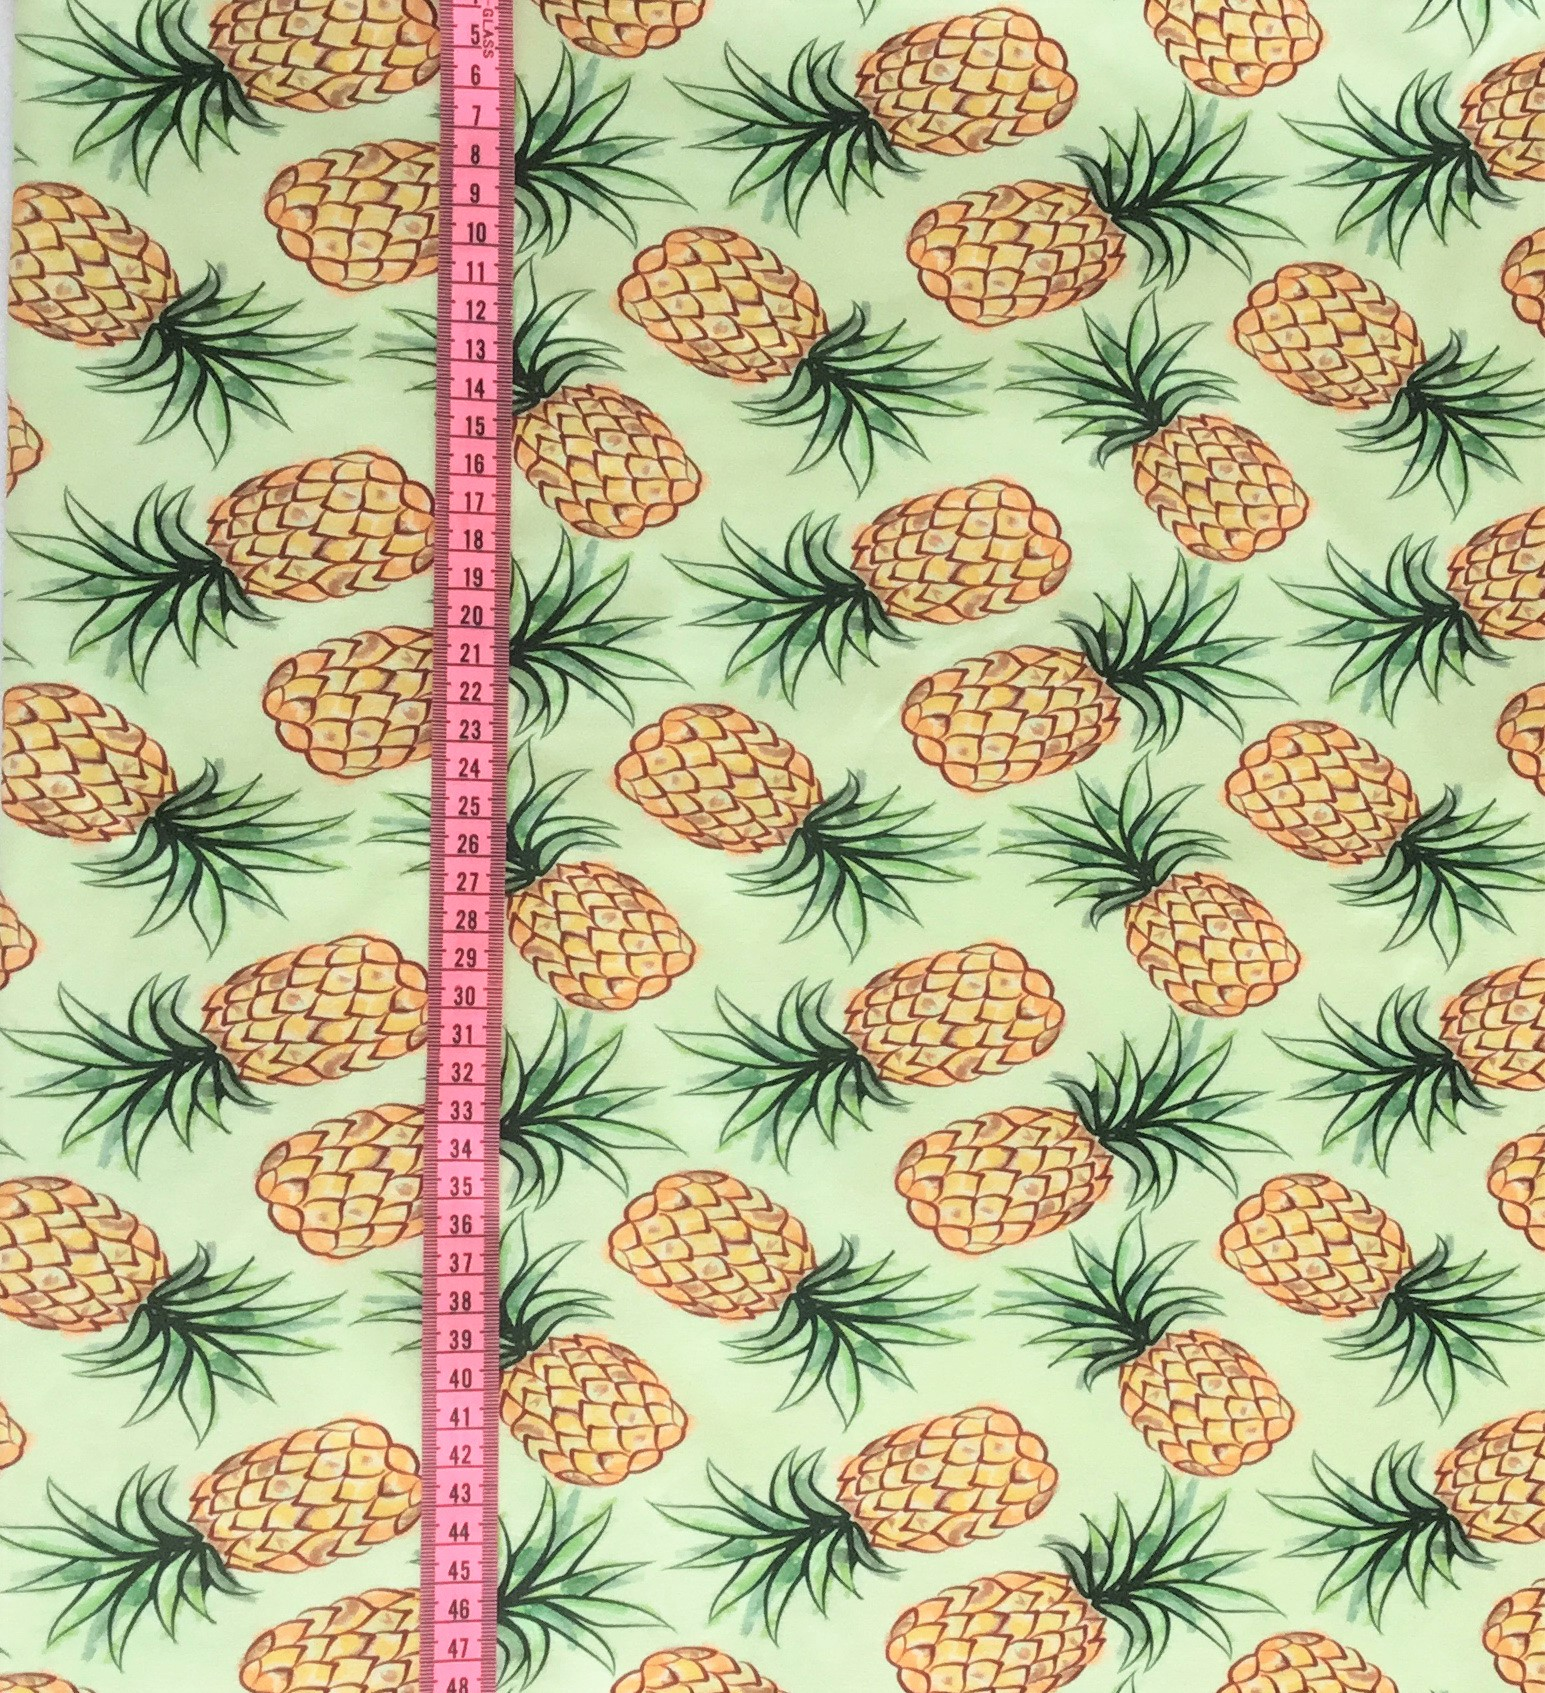 Ananas Big, Ljusgrön #537, ekotyg/GOTS